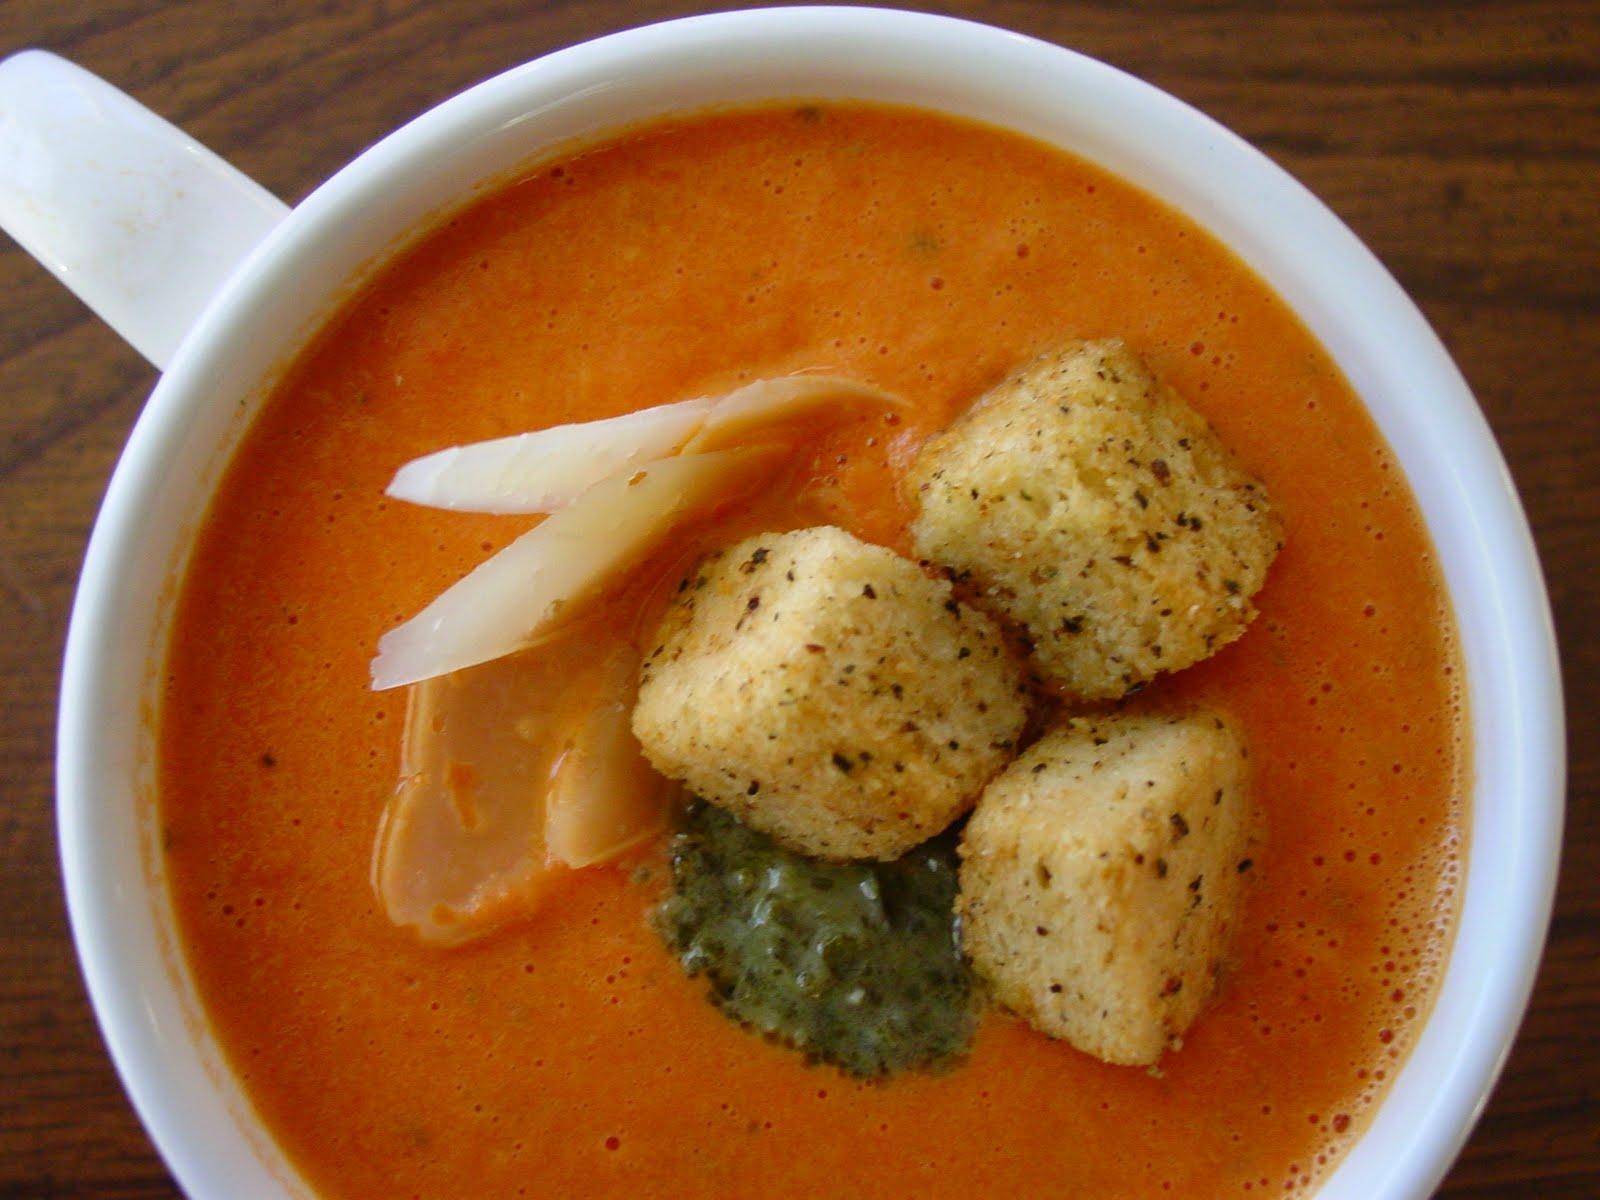 Creamy+Tomato+Soup,+Olivia%27s+Croutons+013.JPG